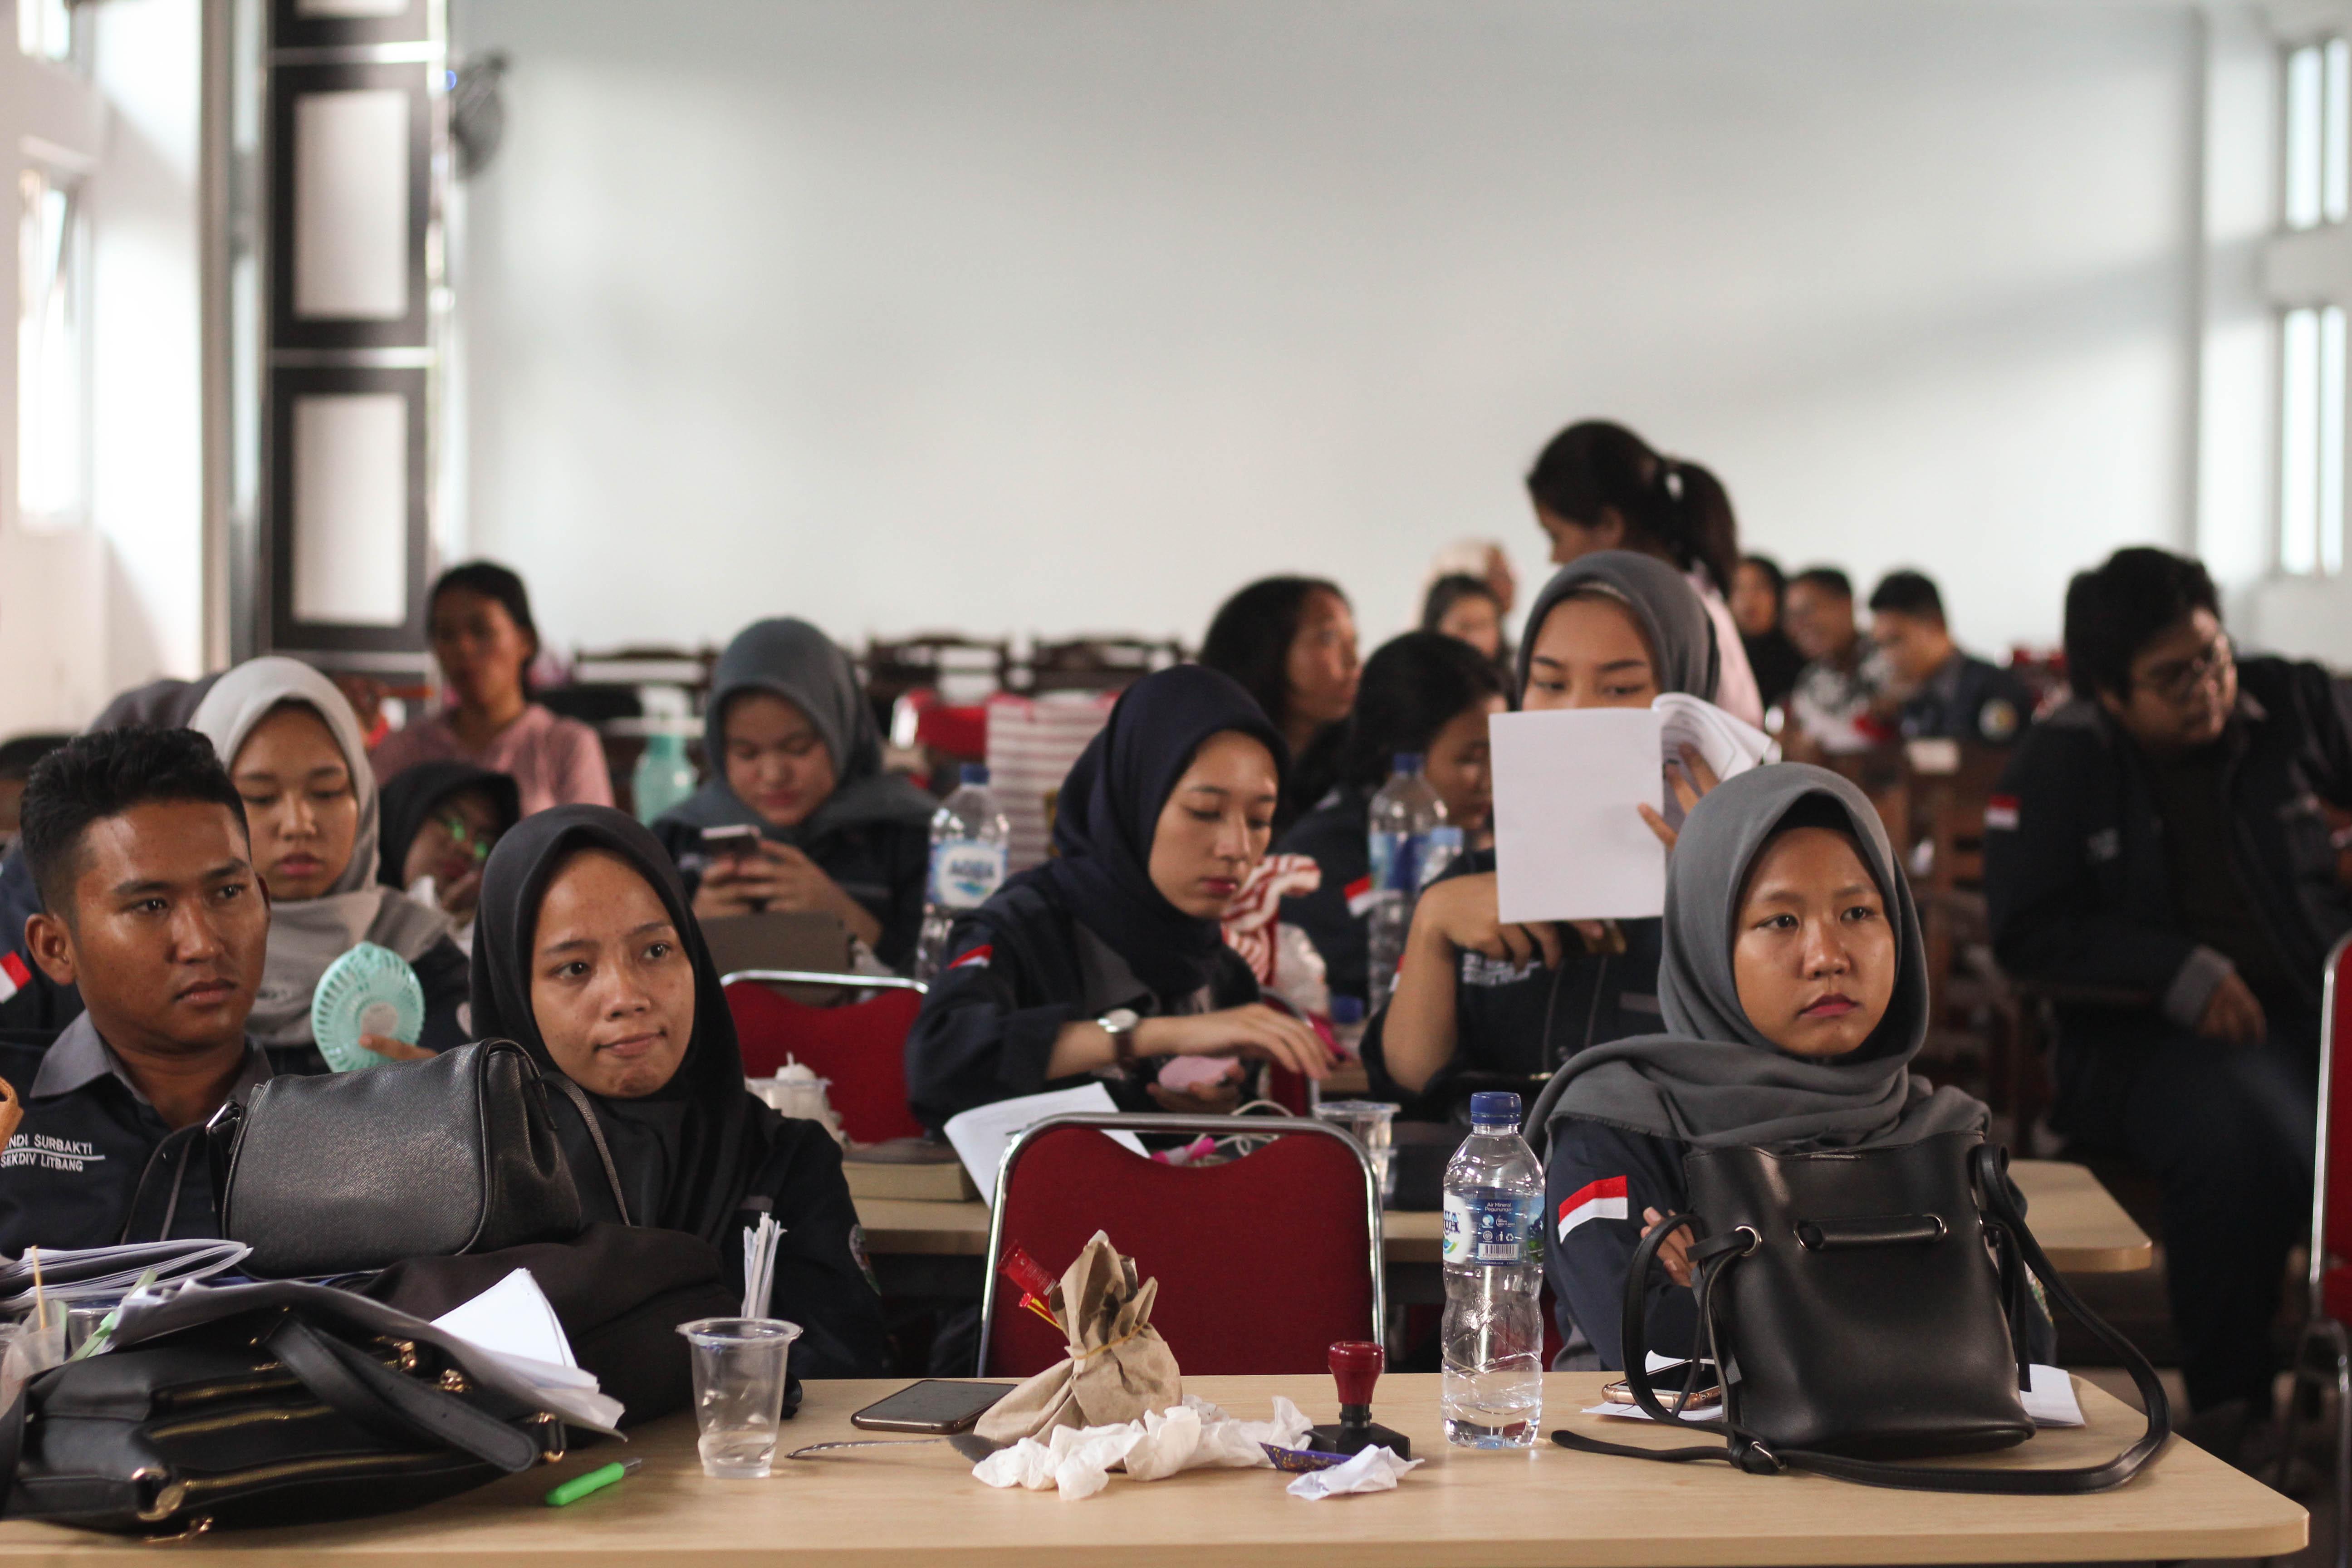 Anggota Forum Musyawarah Program Studi sedang membahas dan mendengarkan pemaparan Laporan Pertanggungjawaban Pengurus IMAJINASI Periode 2018/2019.